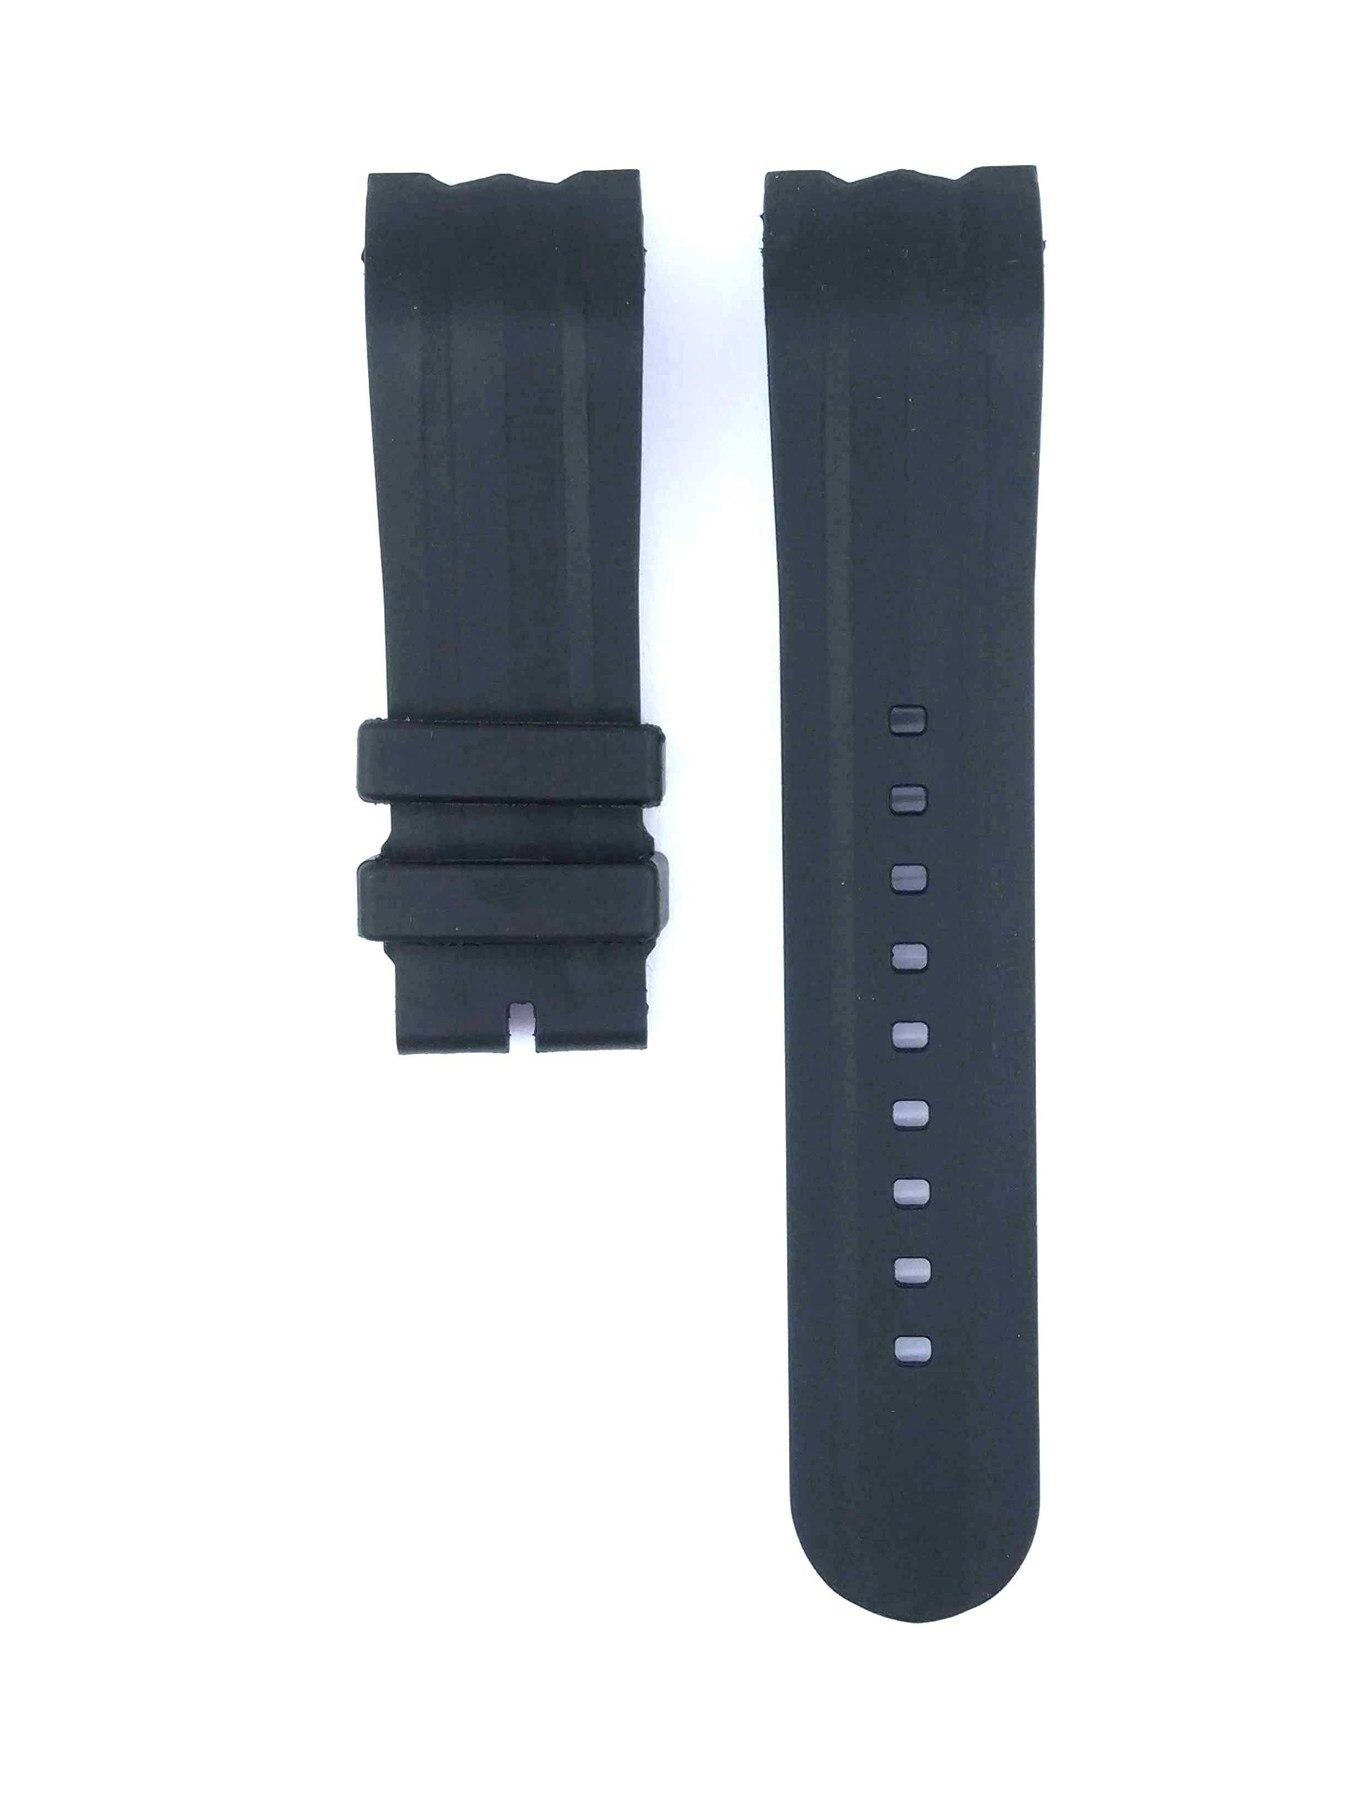 212ZTD correa de reloj de goma negra Compatible con Nautica NST 101 N17591G 24mm 475NTC